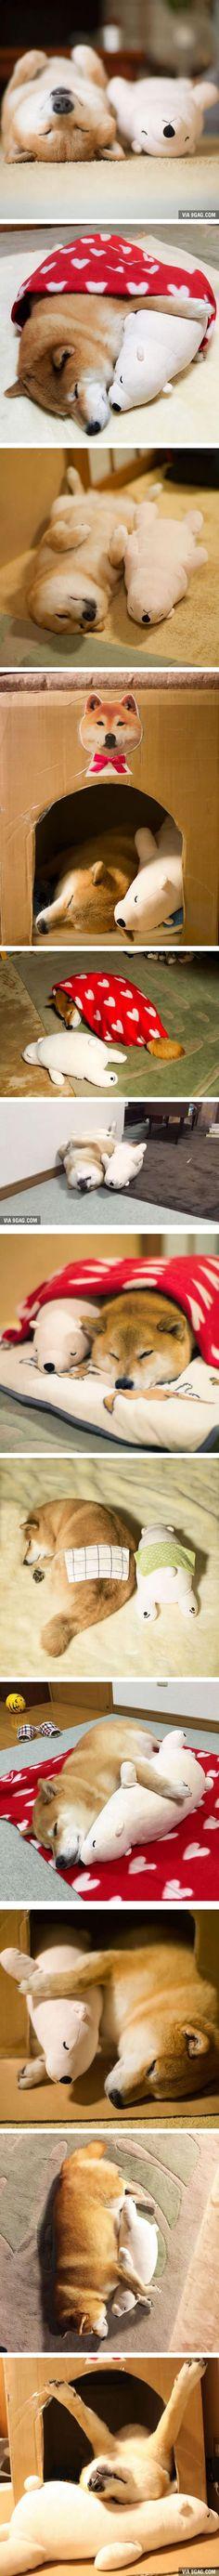 Shiba Inu Maru Loves To Sleep With His Little Stuffed Polar Bear. I kinda want a Shiba Inu. Animals And Pets, Baby Animals, Funny Animals, Cute Animals, Shiba Inu, Cute Puppies, Cute Dogs, Dogs And Puppies, Doggies